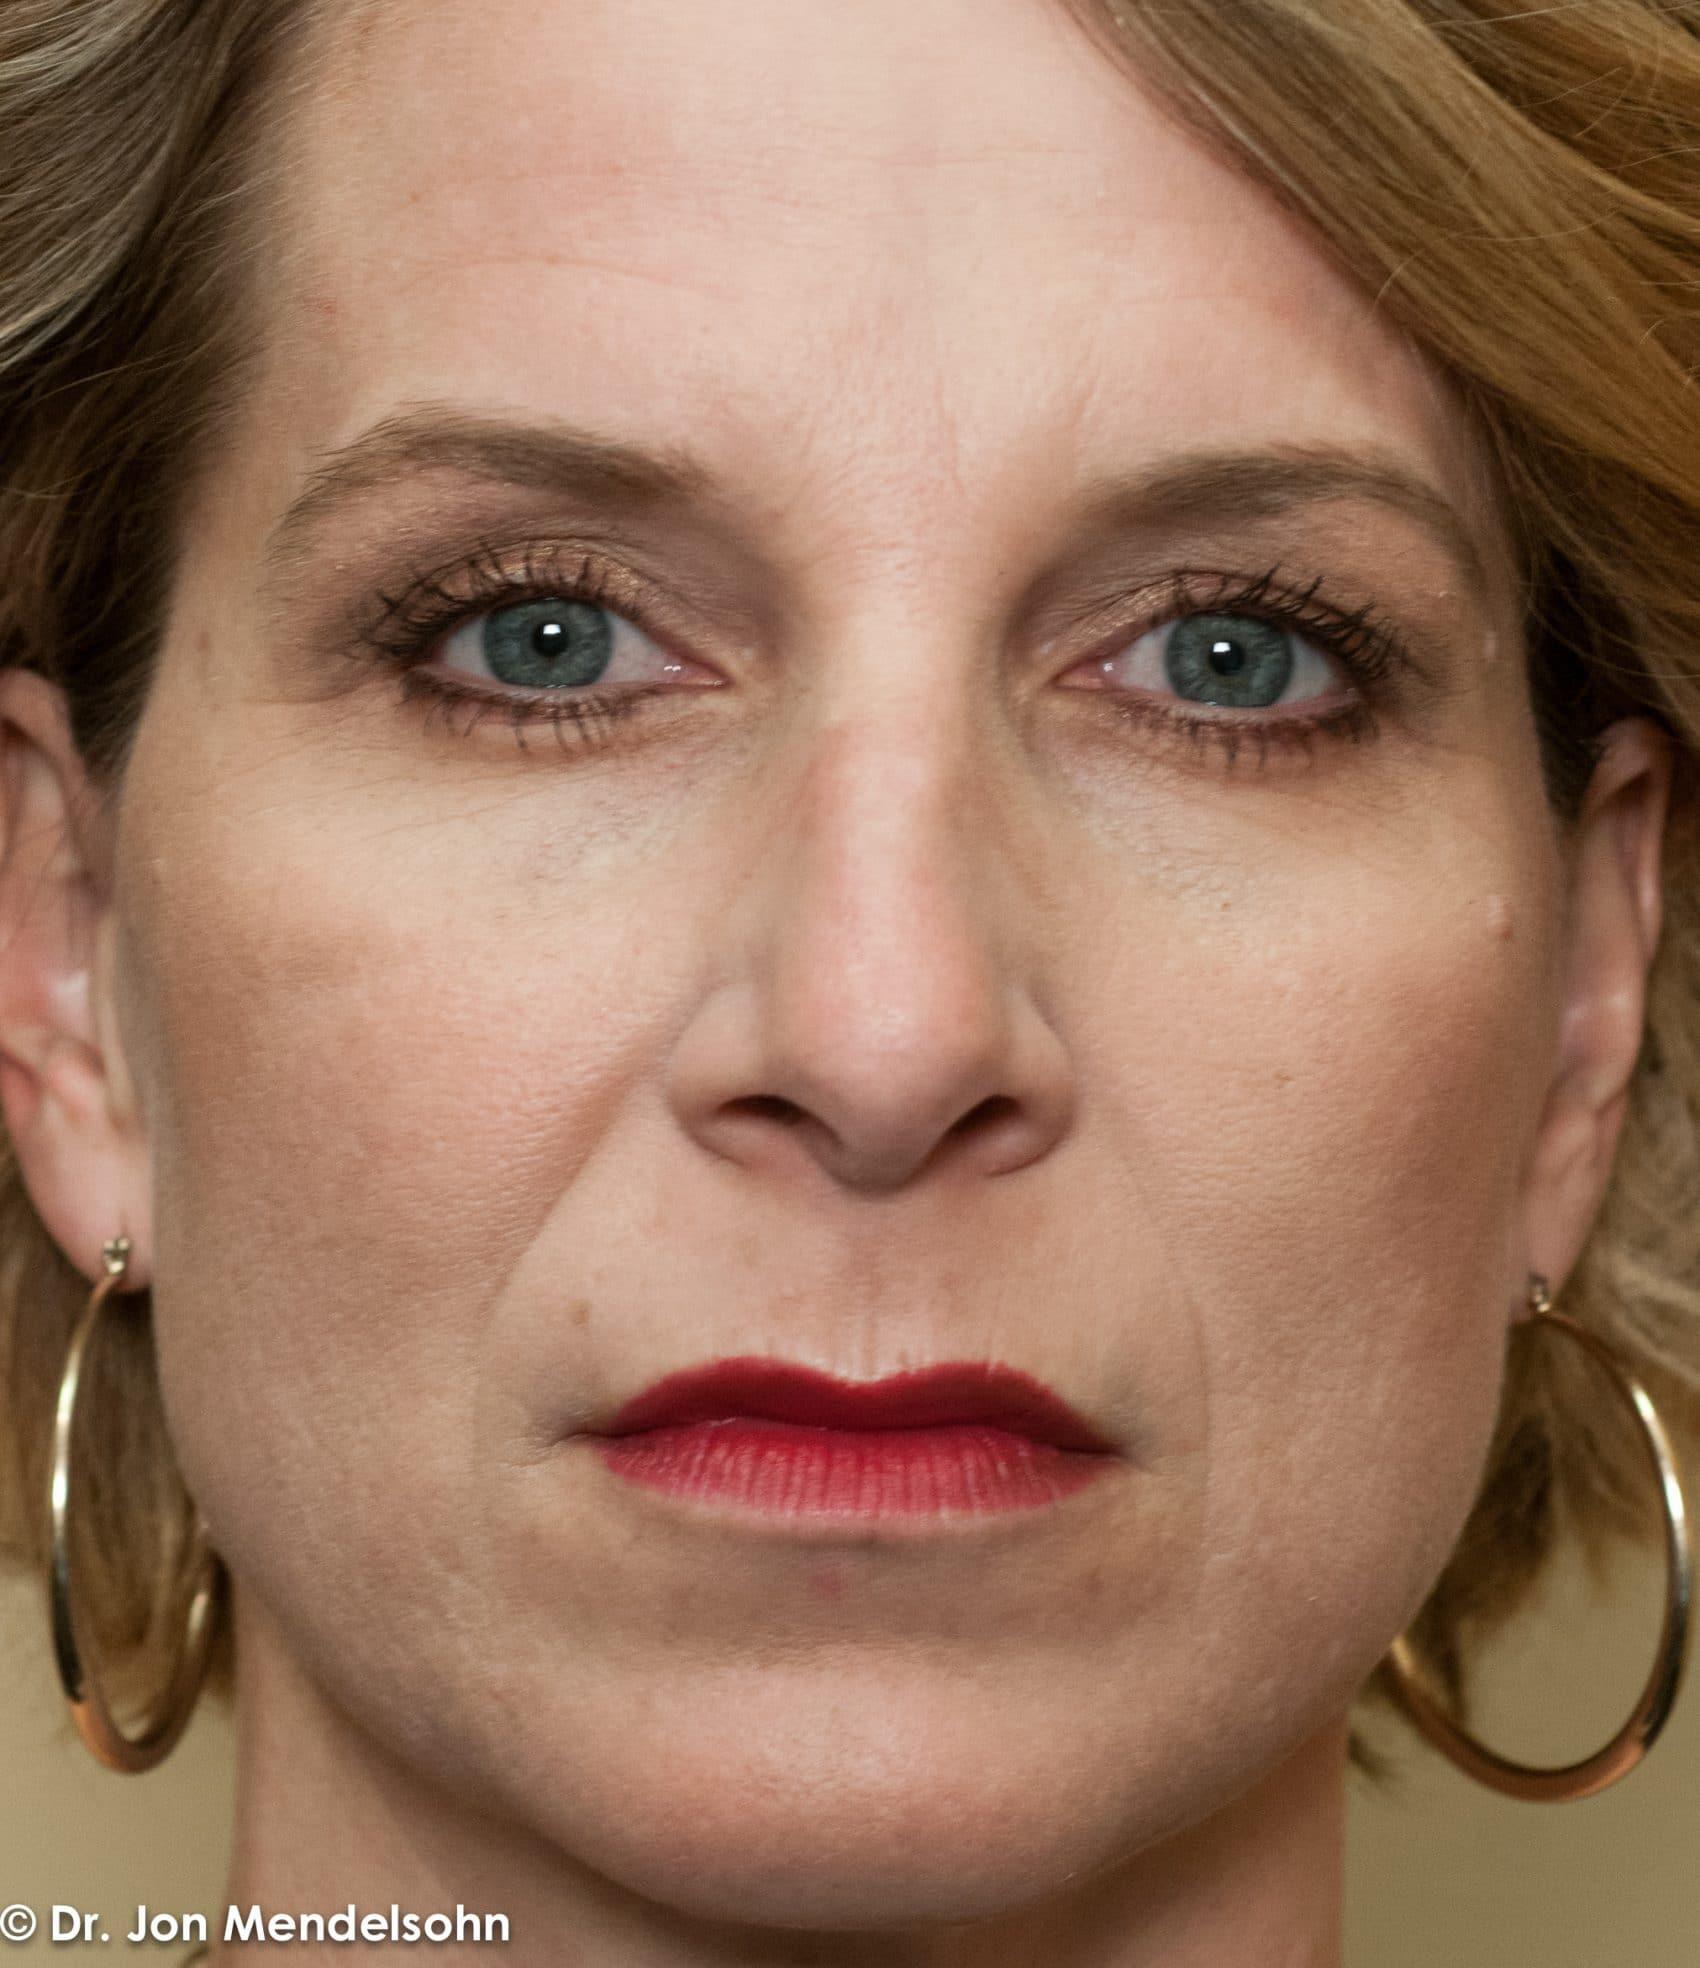 Upper-blepharoplasty-eyelid-surgery-cincinnati-dr-jon-mendelsohn-best-eyelid-surgery-plastic-surgery-realself-truseselfies-frontal-before-Kreimer_Jeanine-34813-2